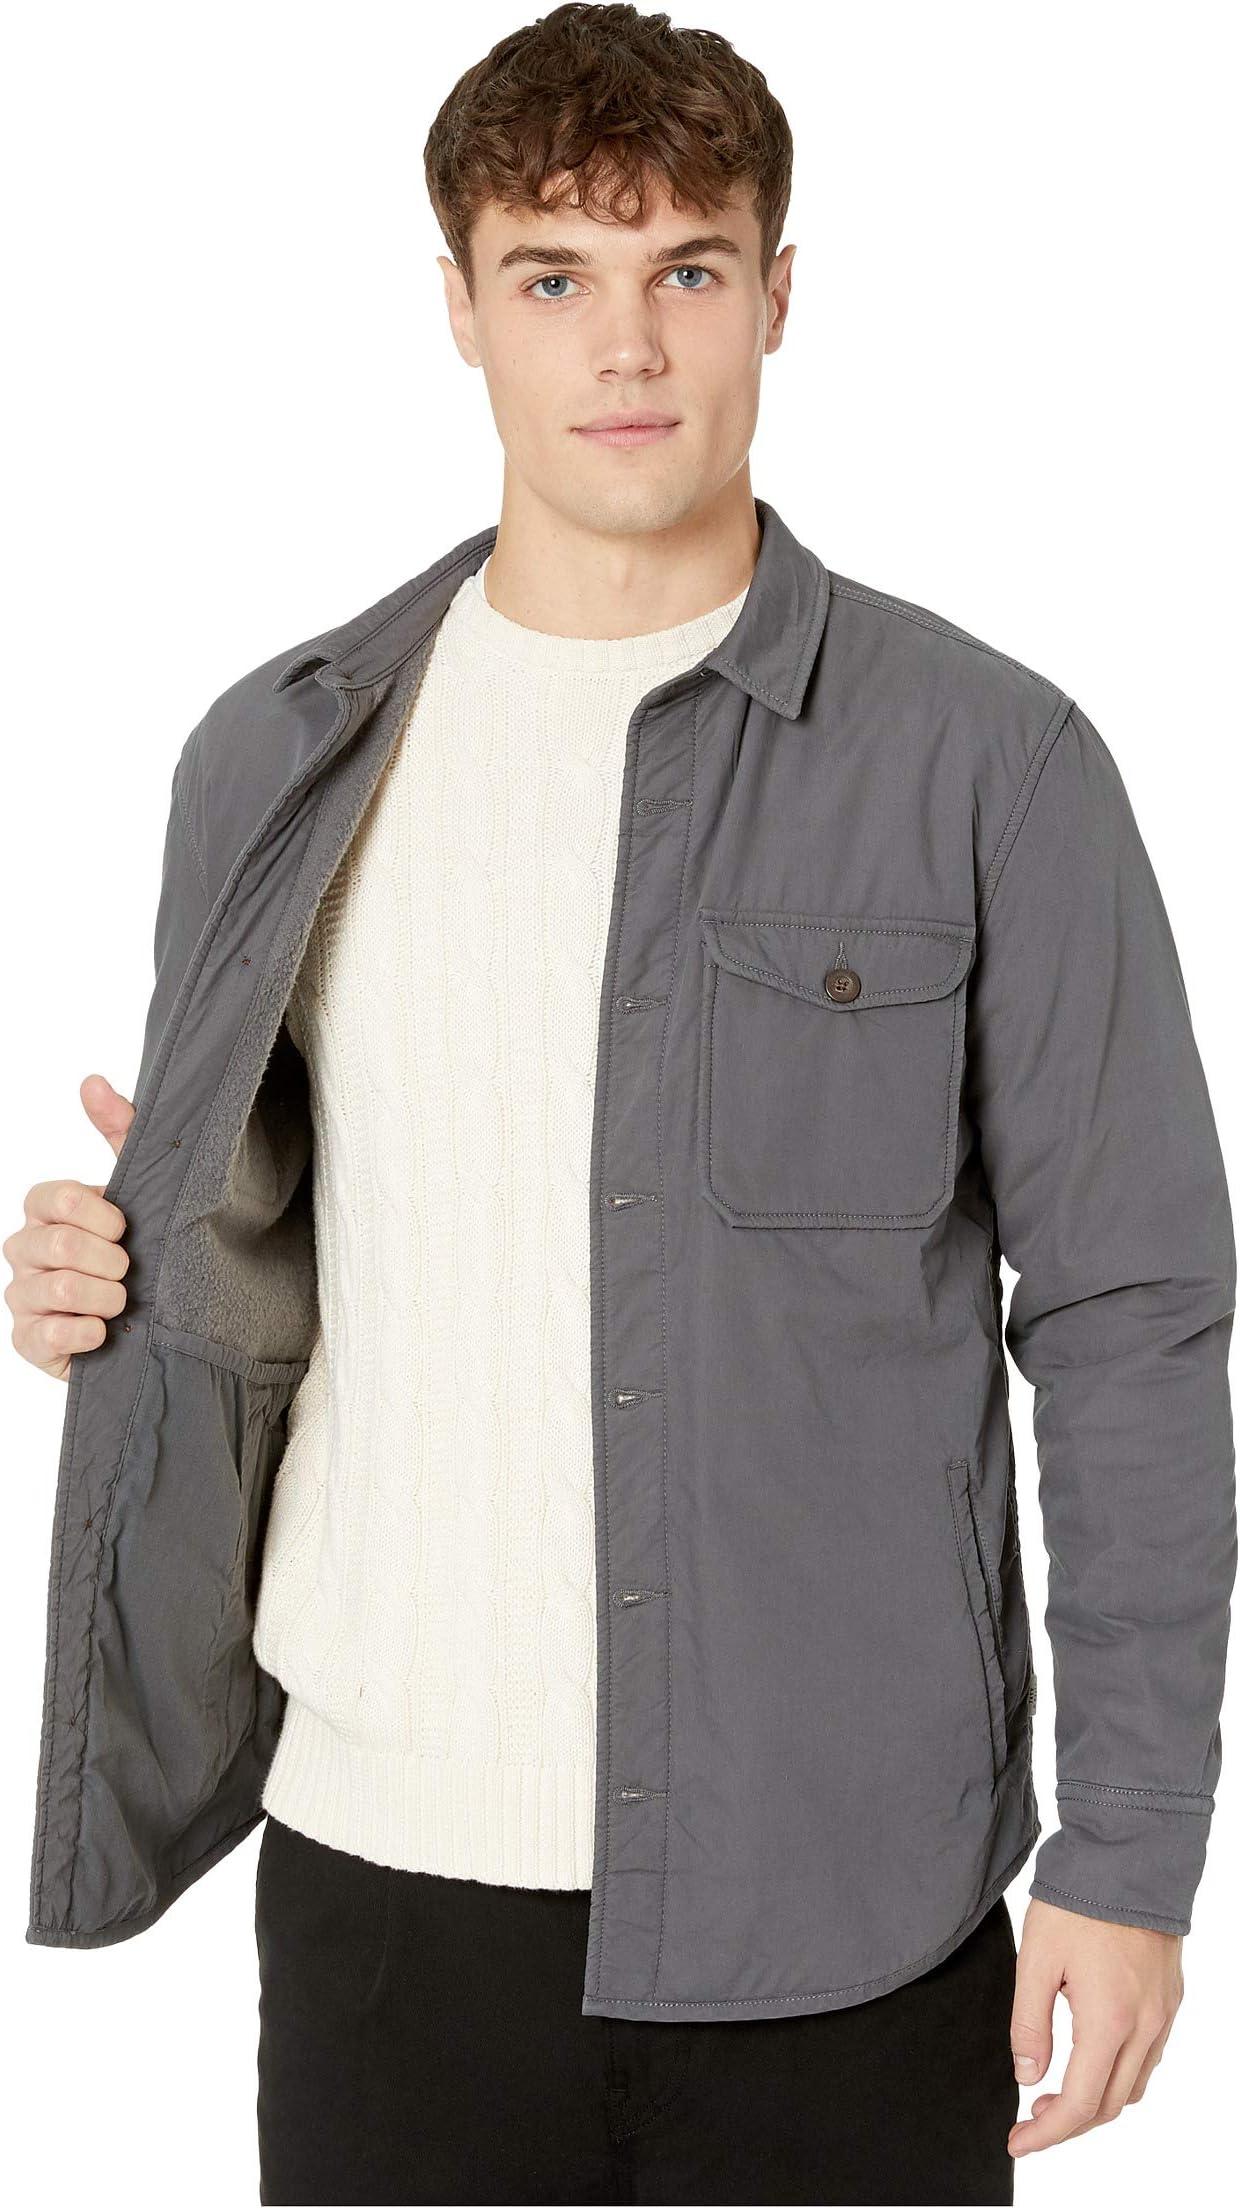 O'Neill Fireside Jacket MfjMZ